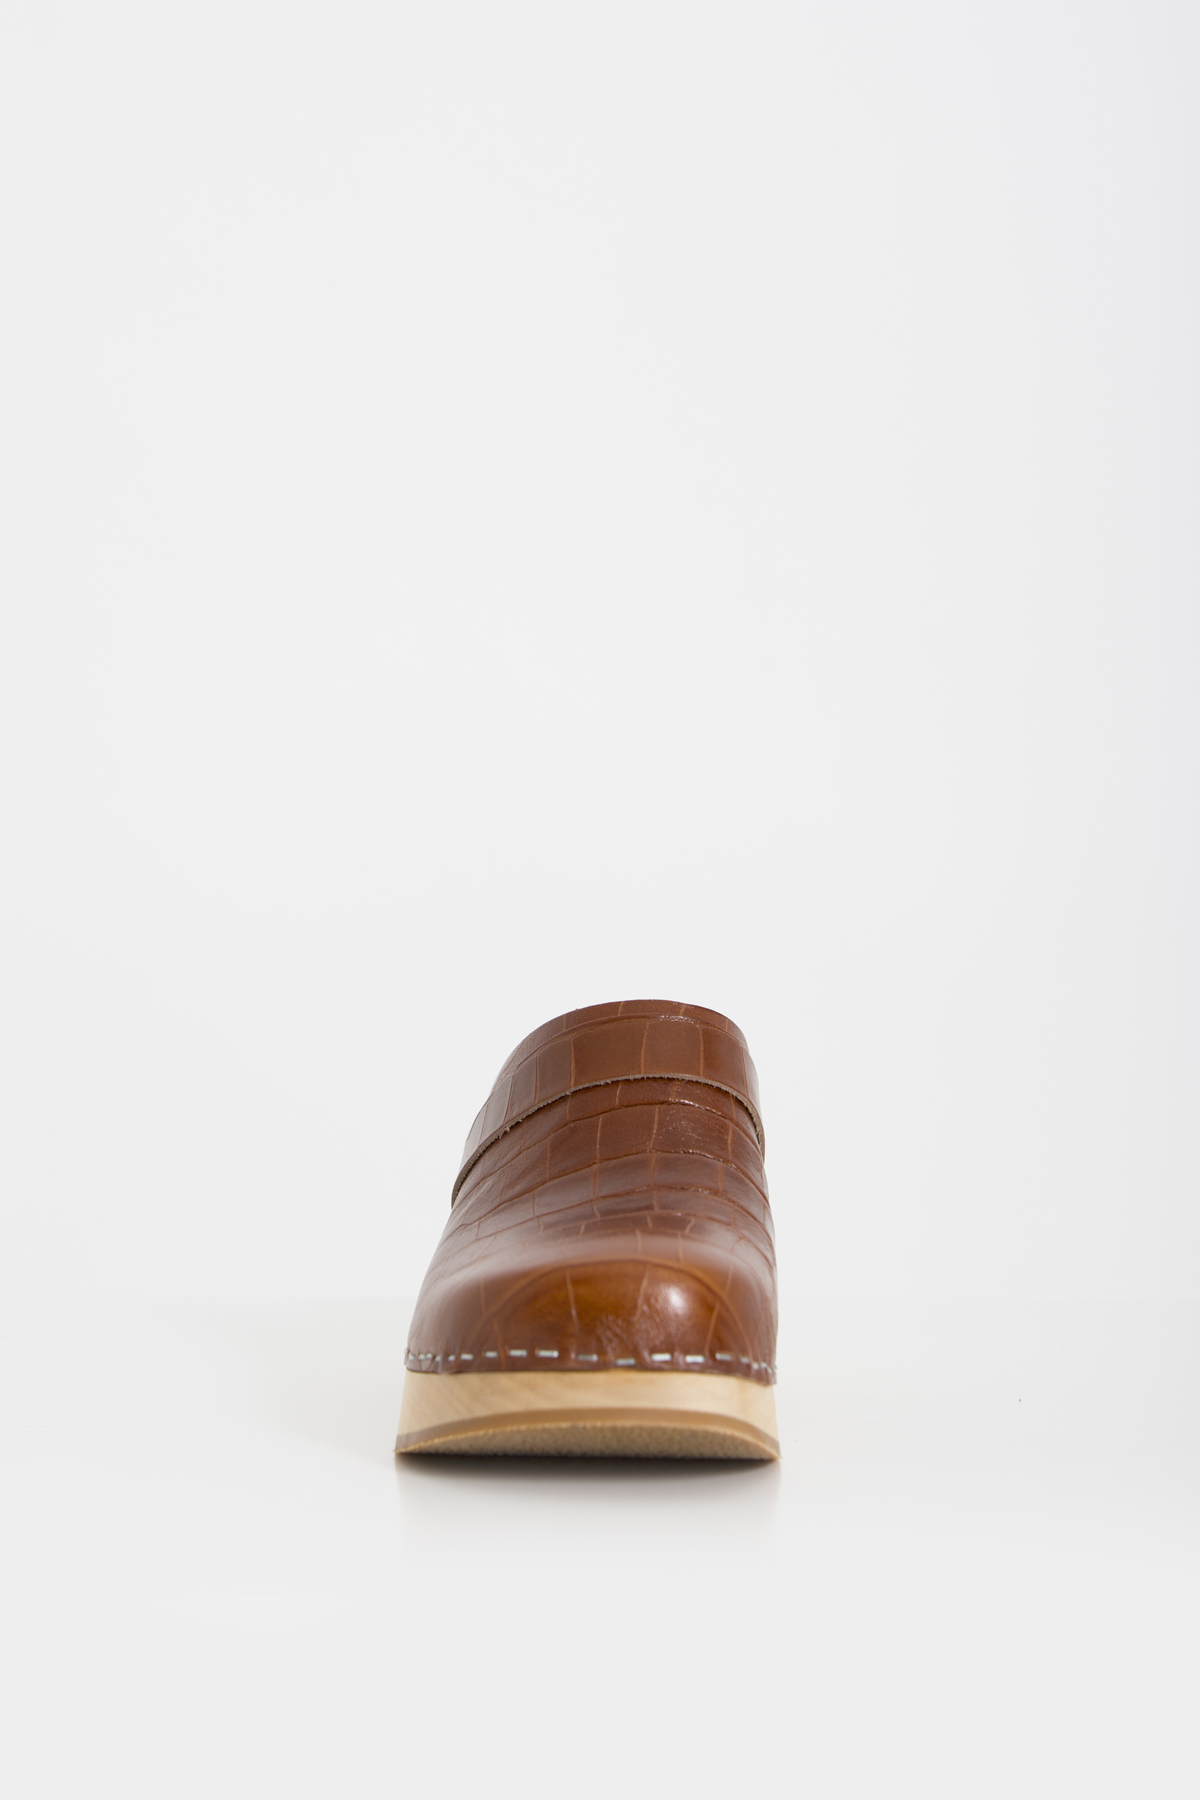 gadny-croc-clogs-cognac-swedish-hasbeens-matchboxathens